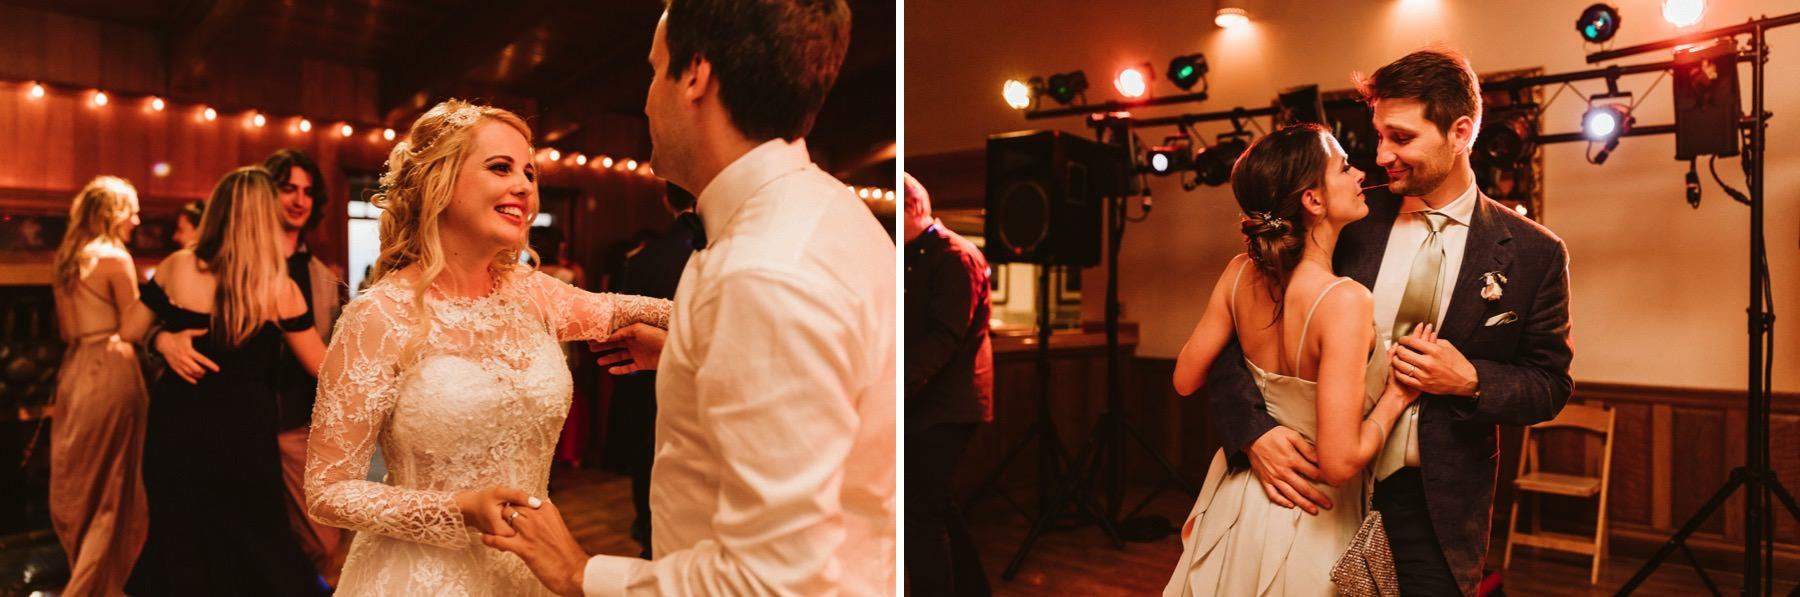 wedding photographer Palo Alto